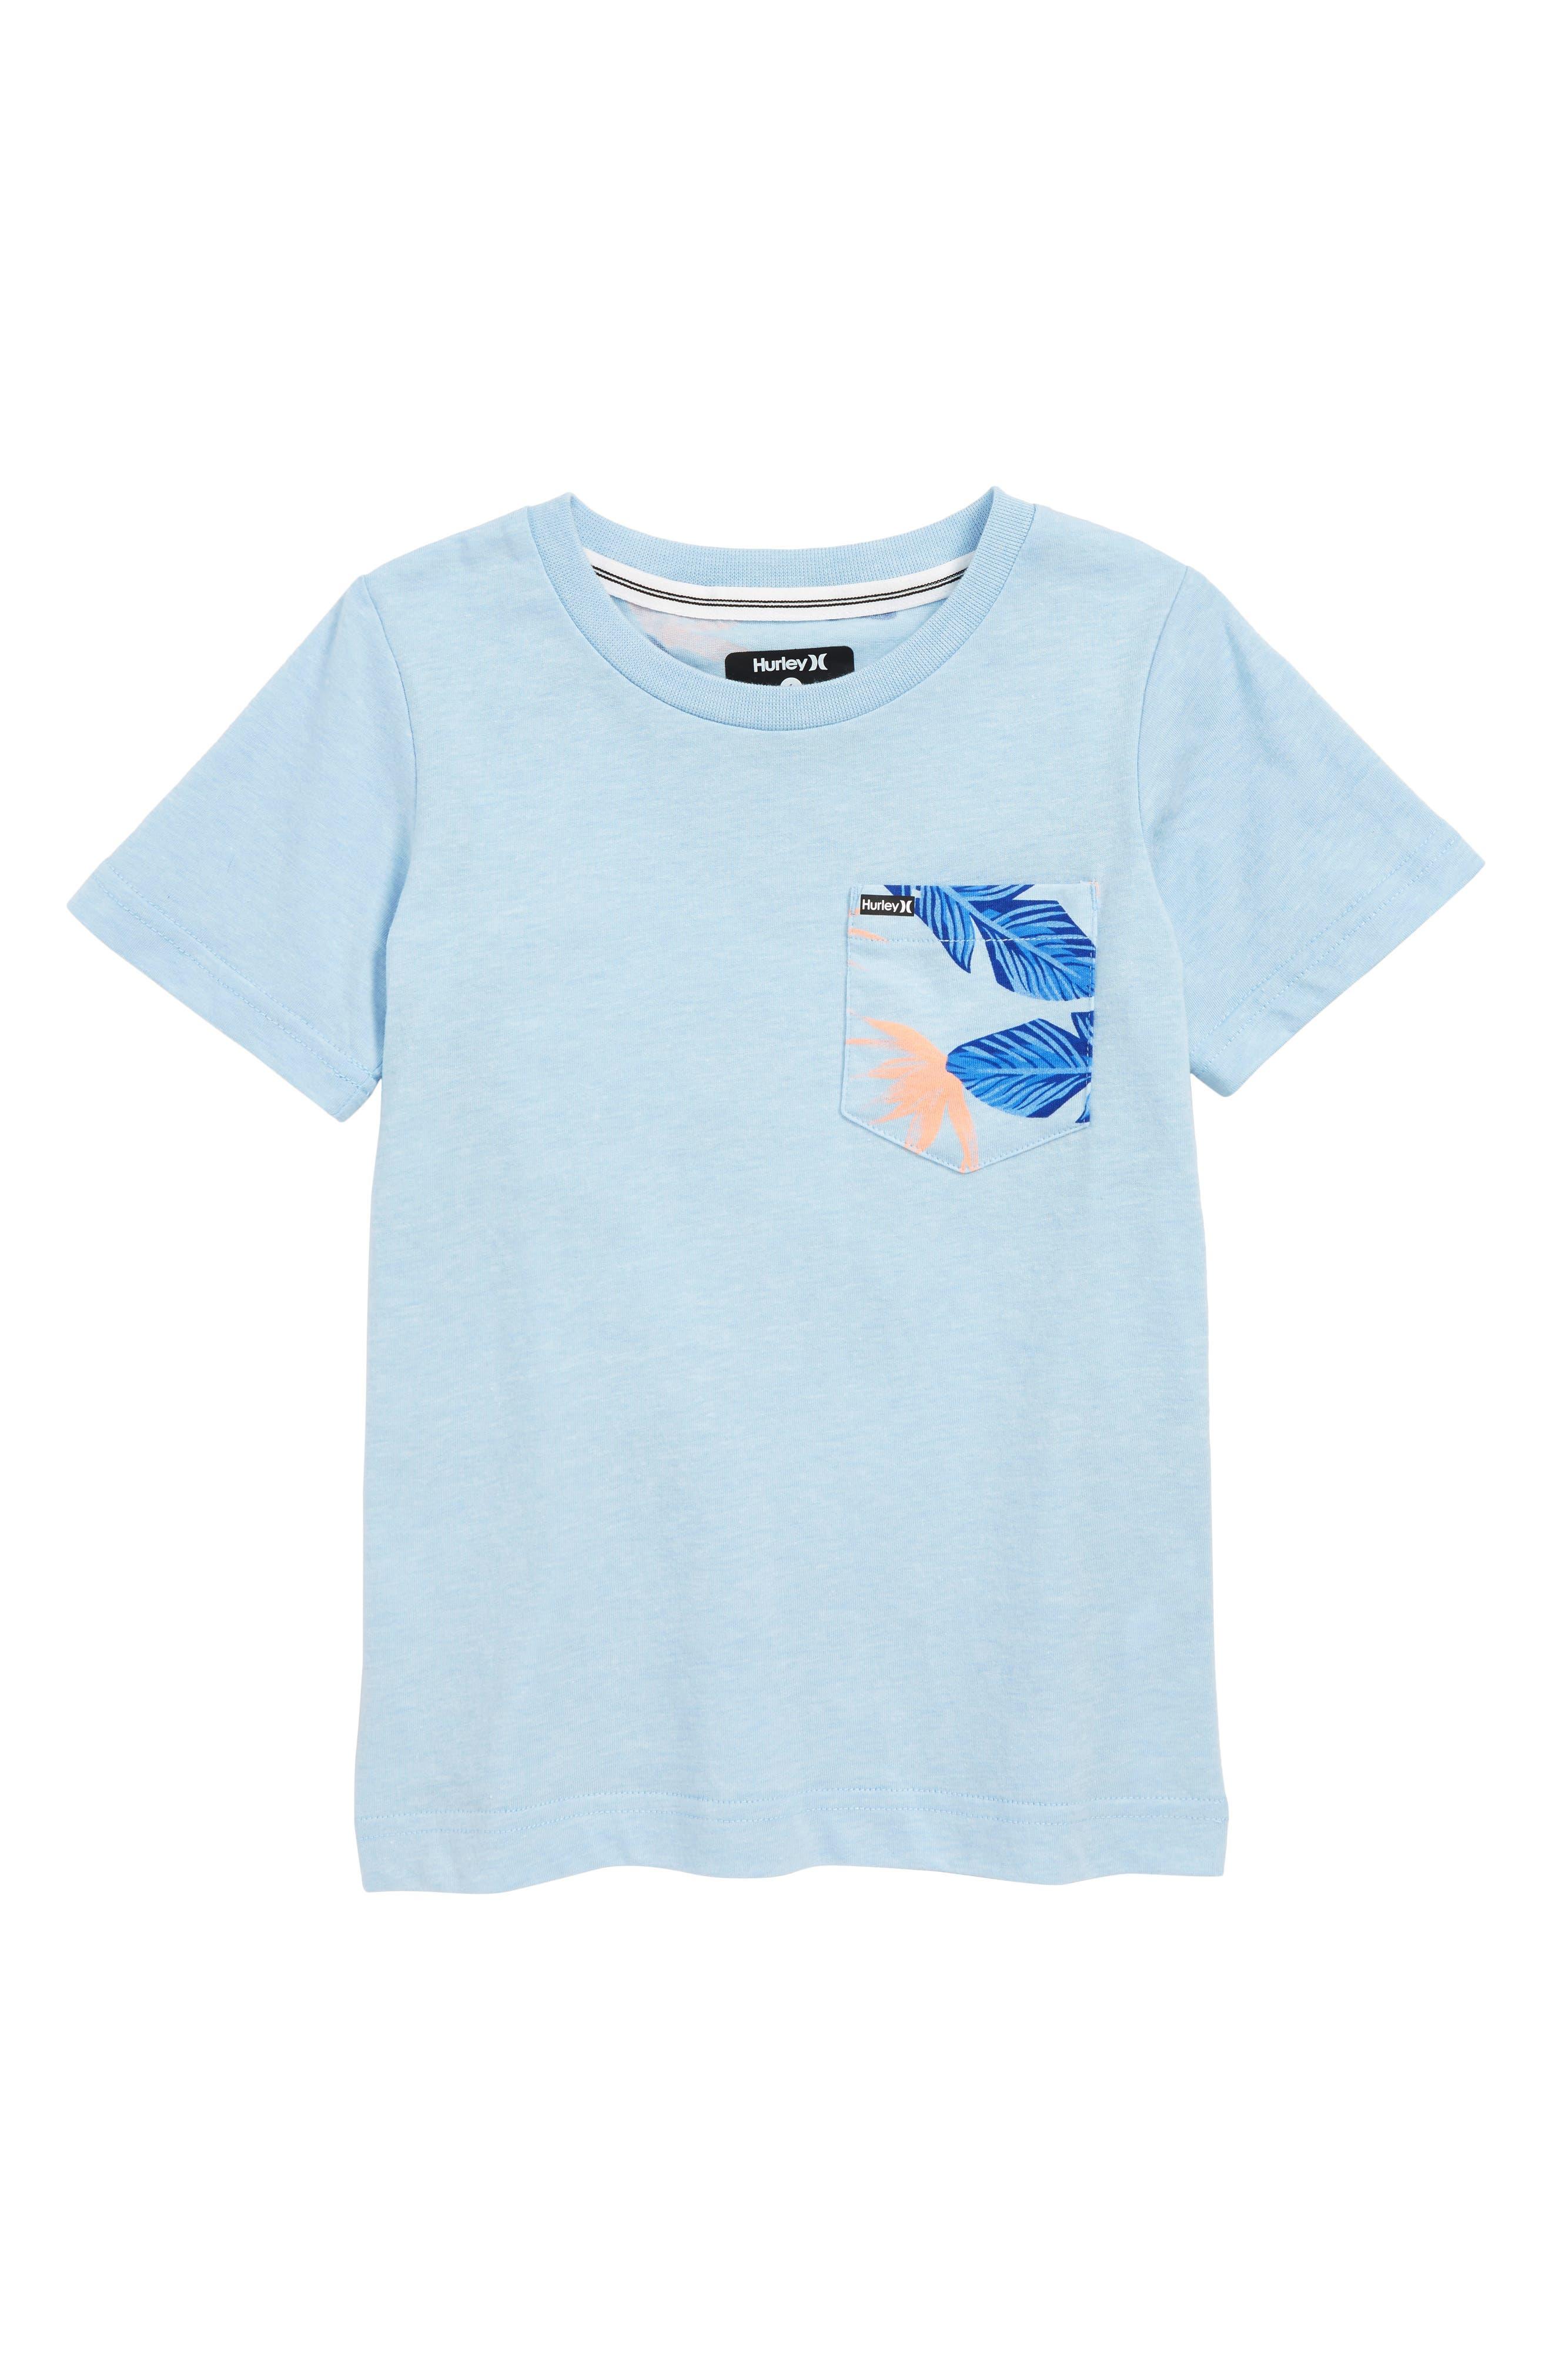 HURLEY Paradise T-Shirt, Main, color, CHAMBRAY BLUE HEATHER